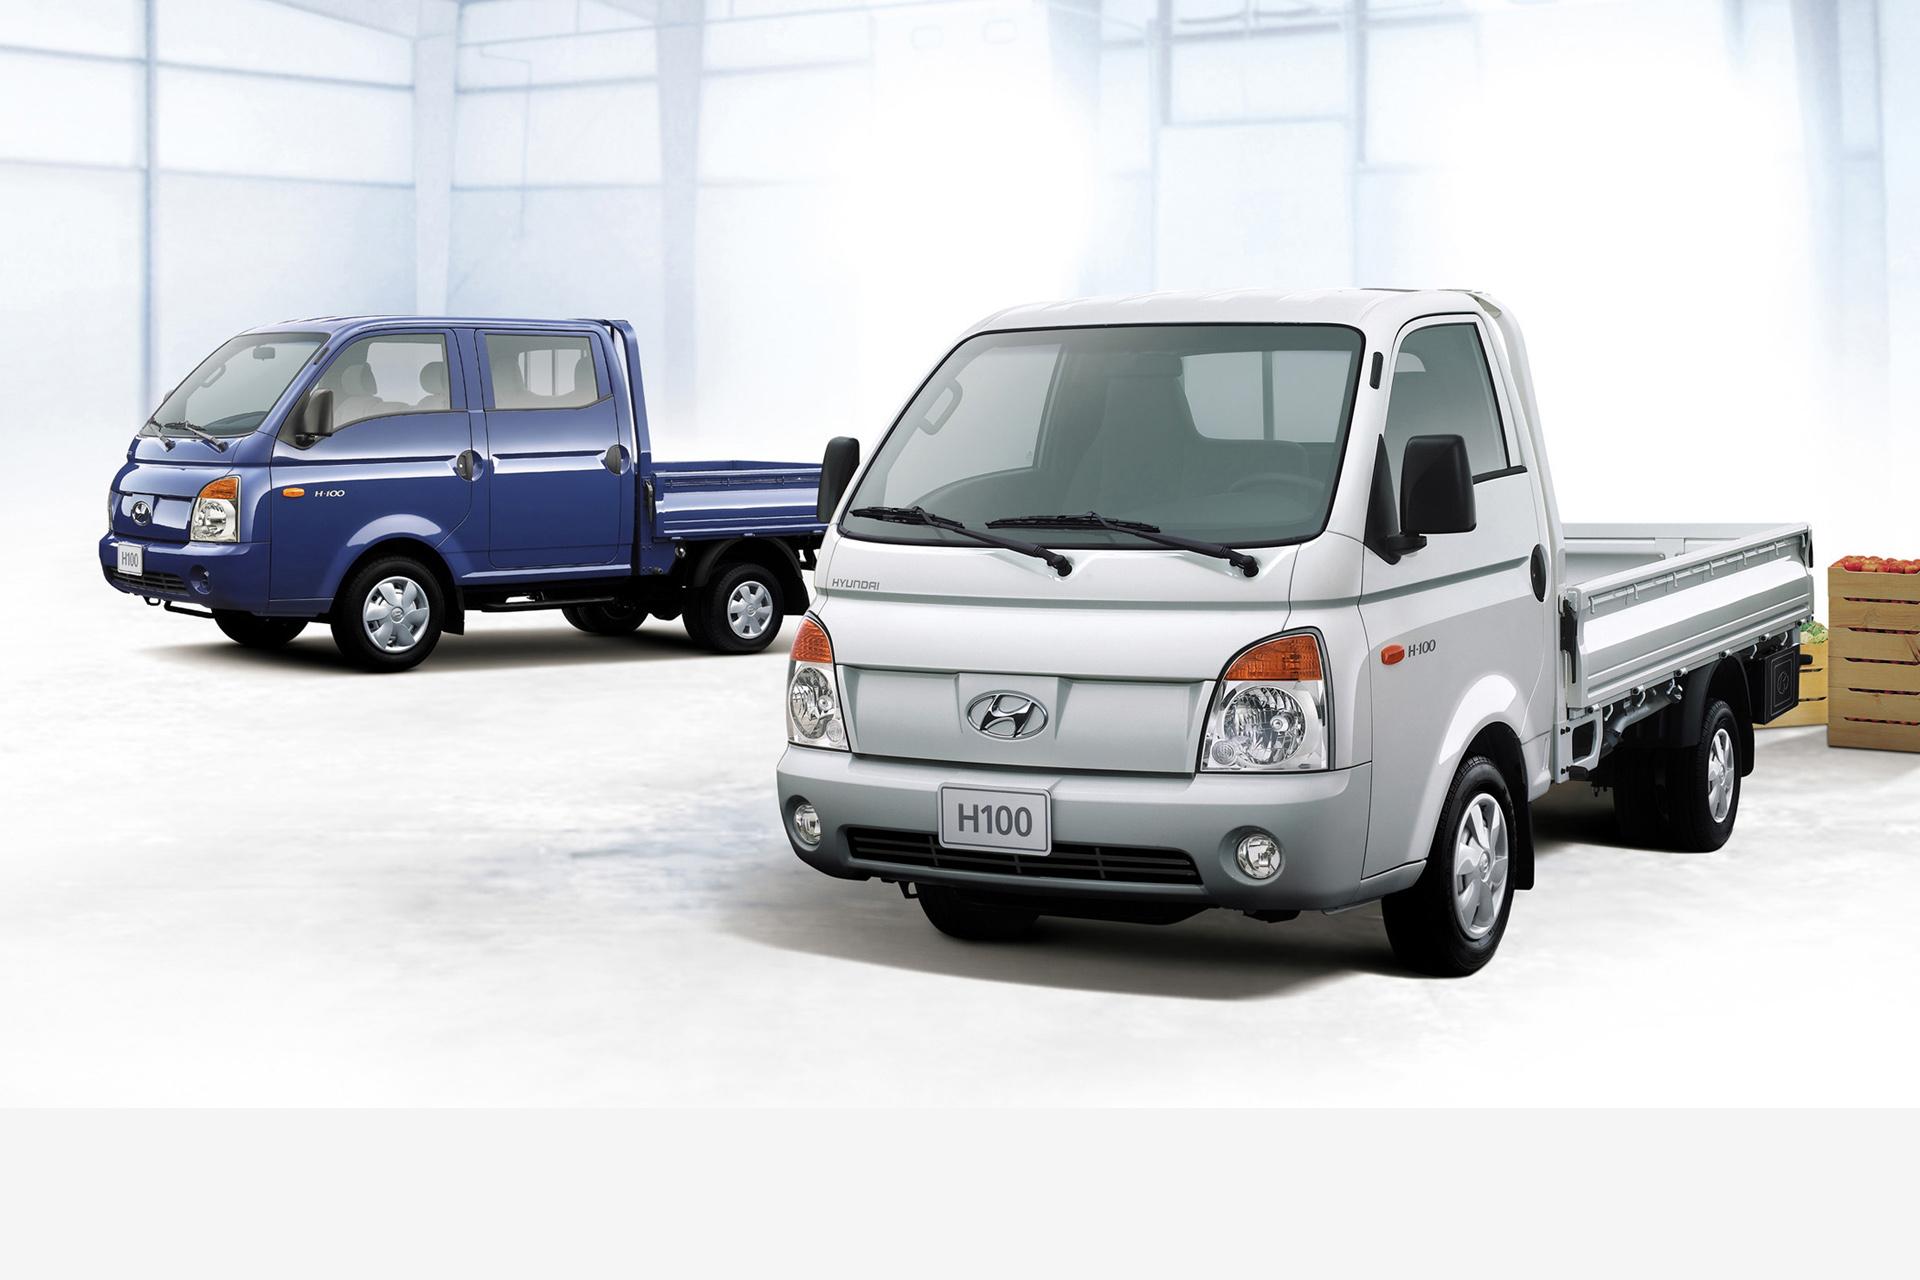 Hyundai H100 Picture # 62024